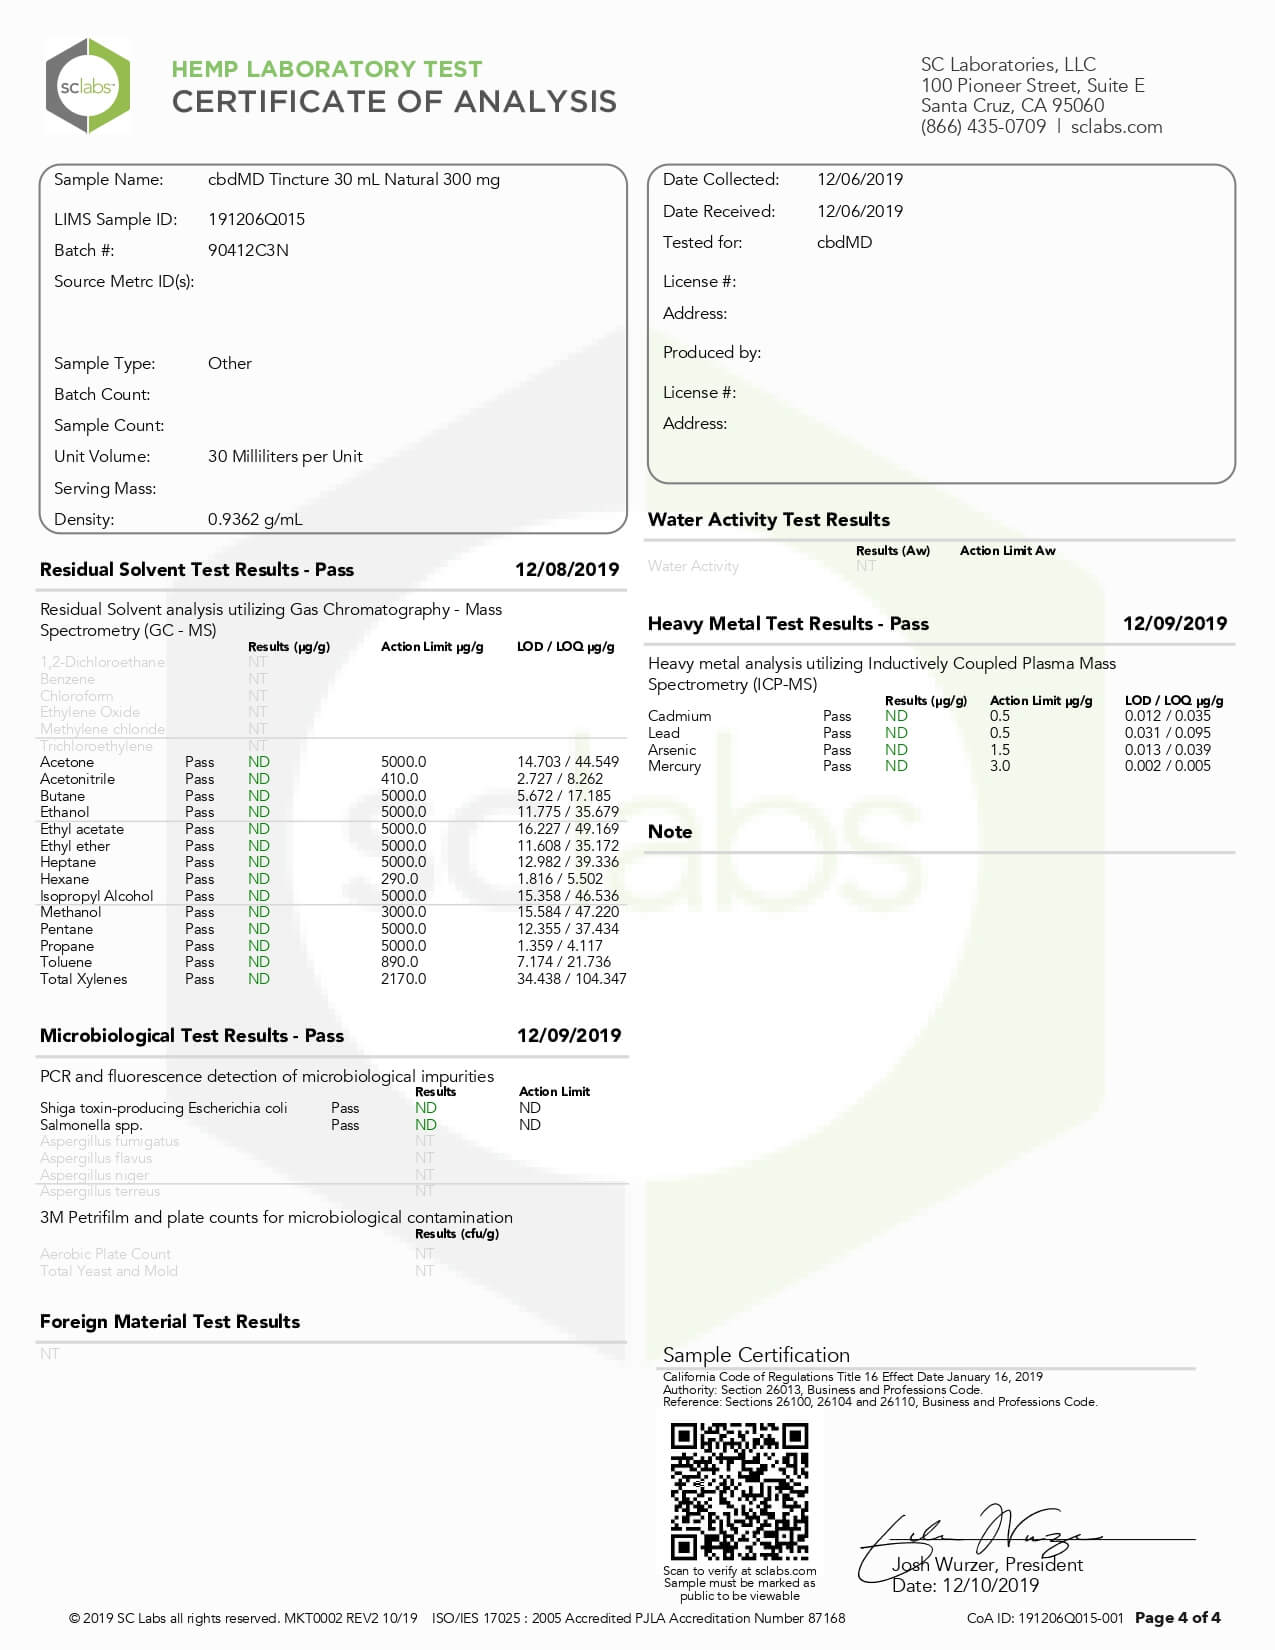 cbdMD CBD Tincture Broad Spectrum Orange 30ml 300mg Lab Report